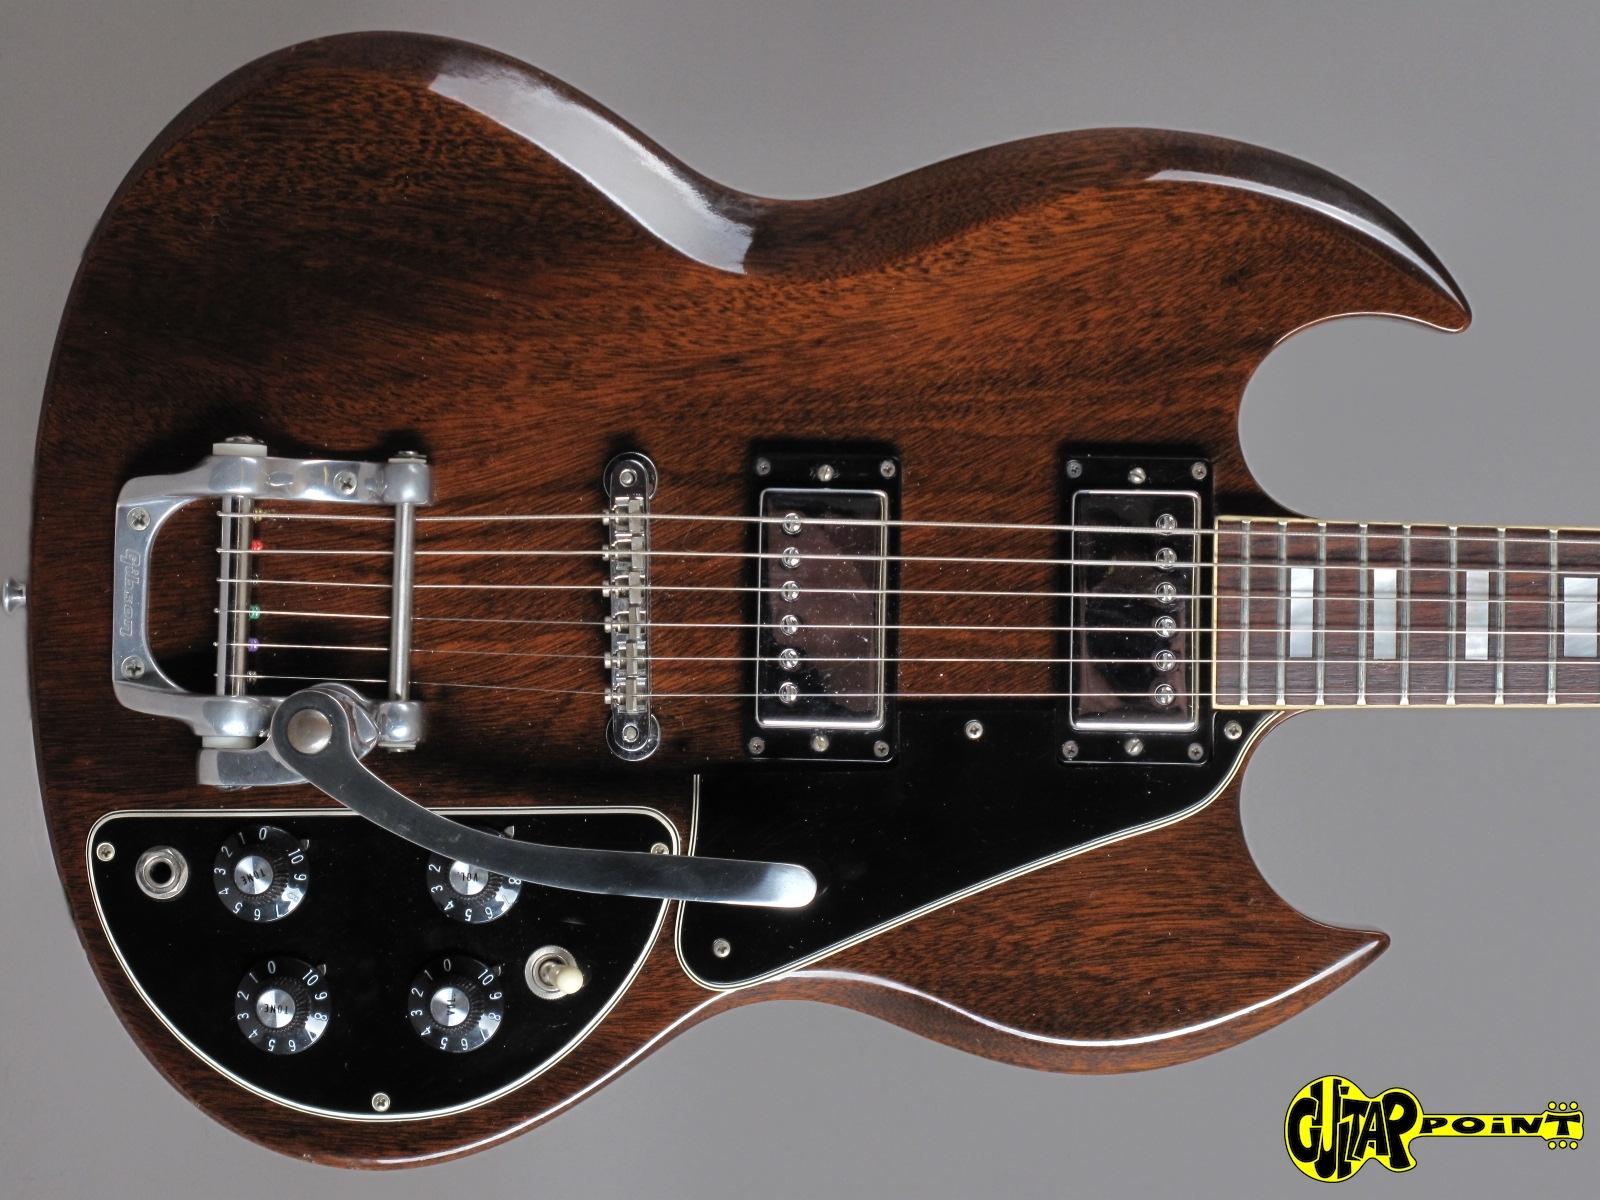 https://guitarpoint.de/app/uploads/products/1971-gibson-sg-deluxe-walnut-2/Gibson71SGDlxCH629540_2q.jpg